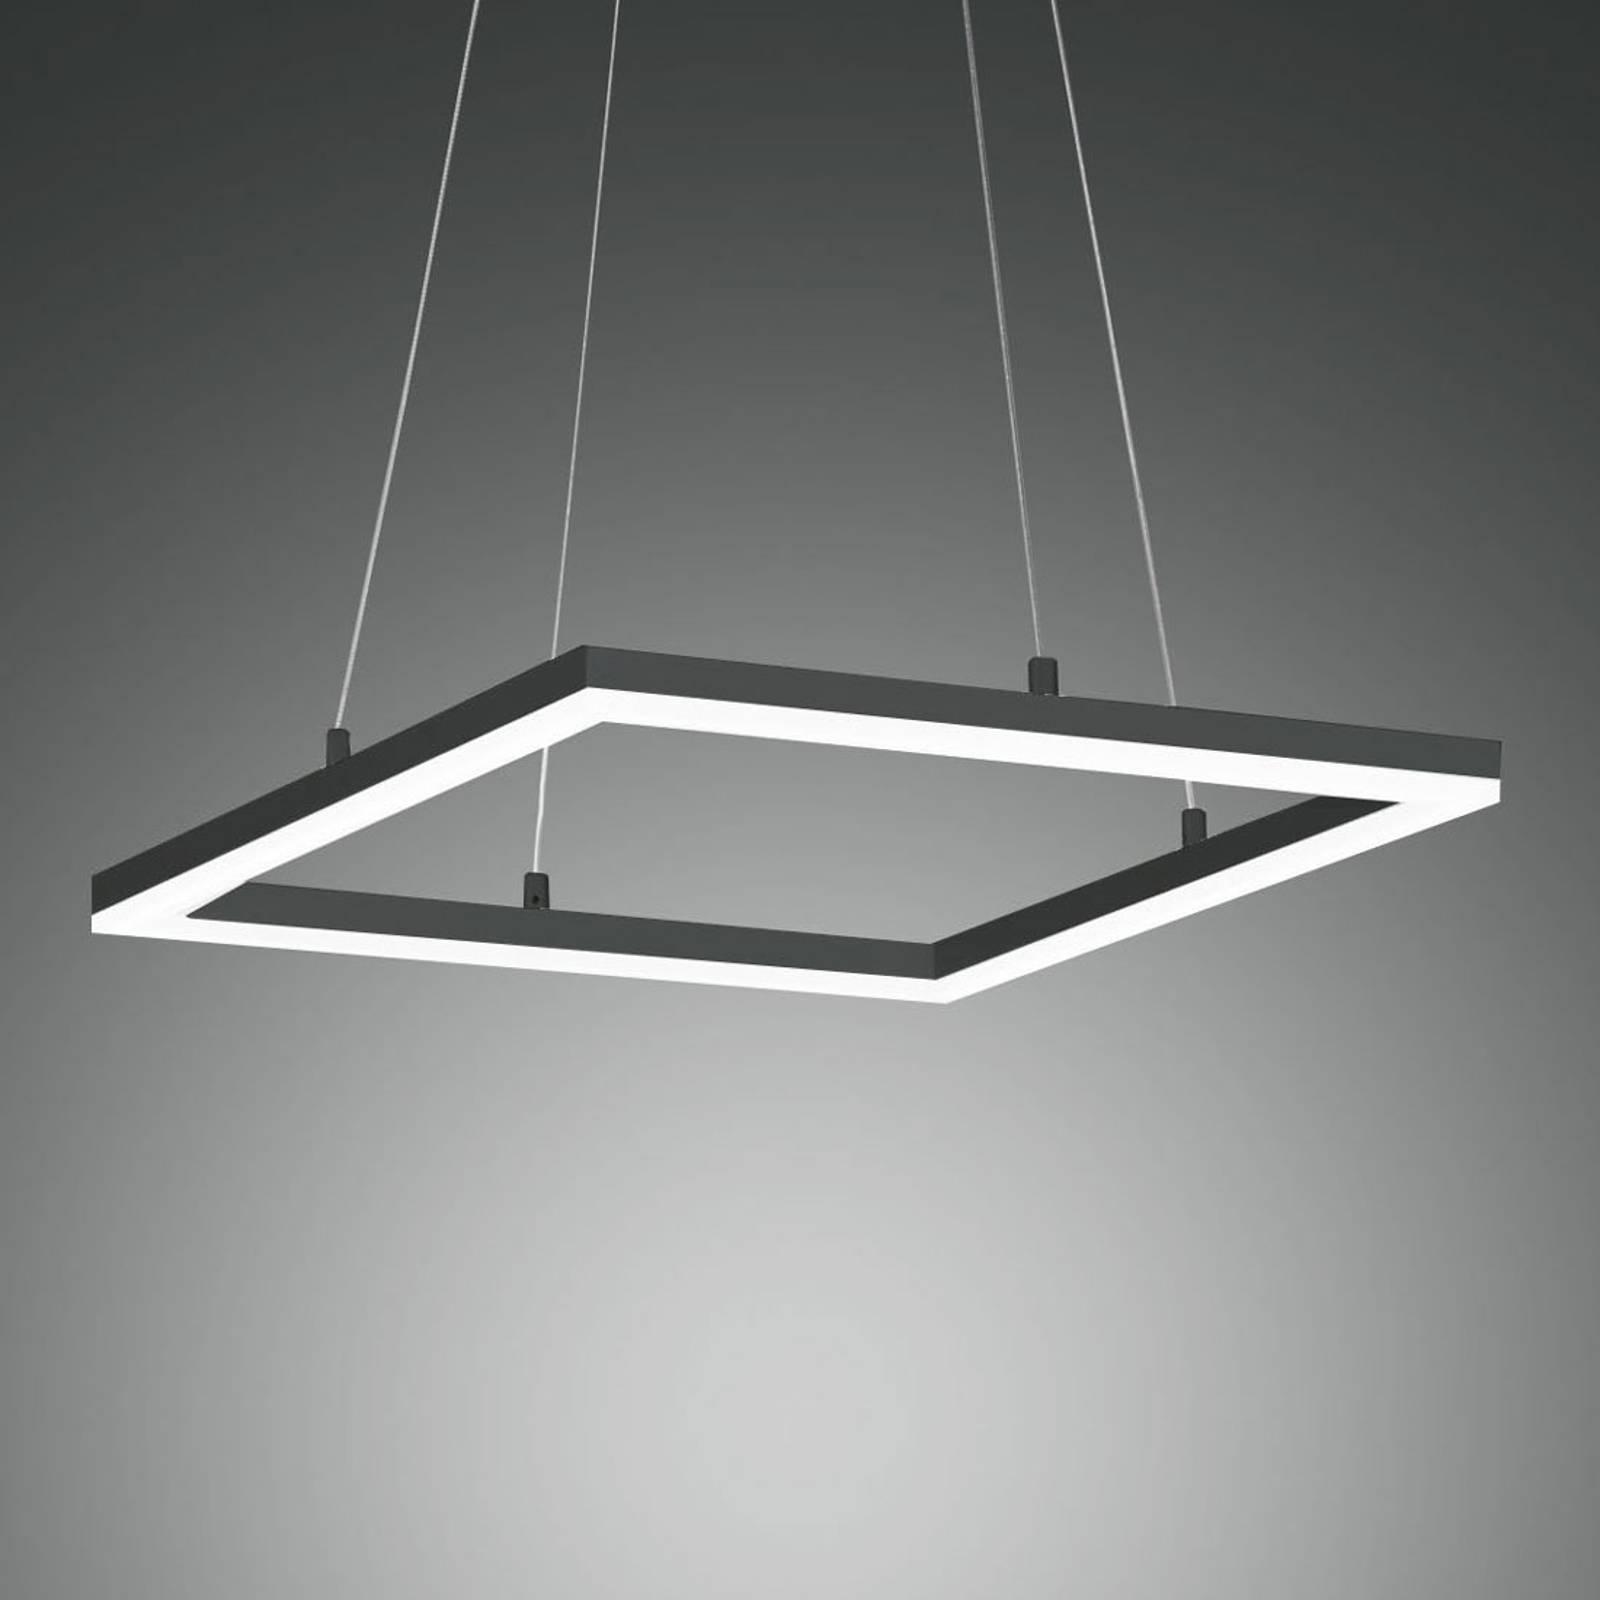 Lampa wisząca LED Bard 42x42, antracyt